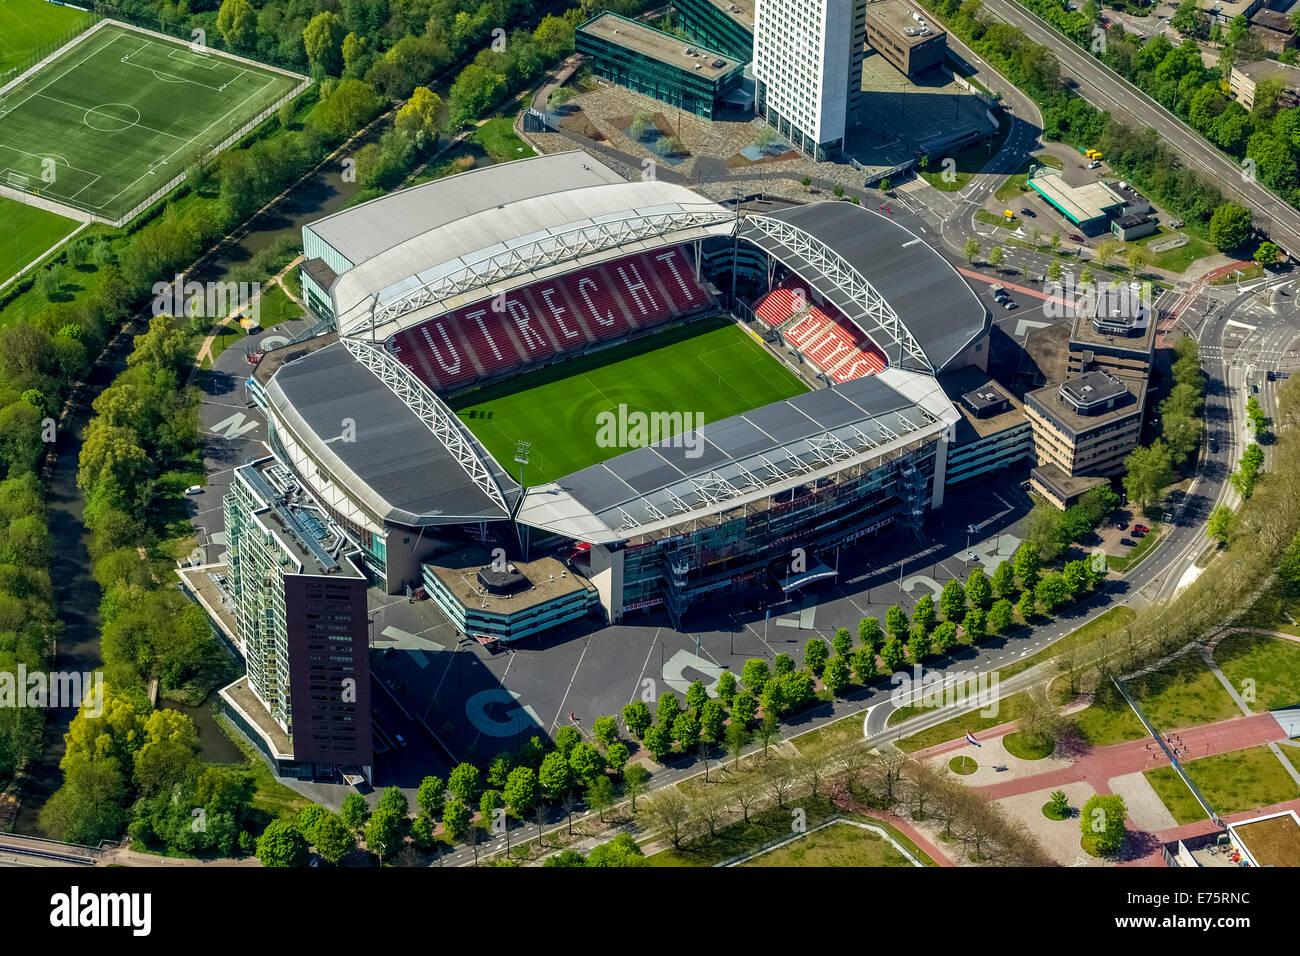 Aerial view, Stadion Galgenwaard, football stadium, Utrecht, Province of Utrecht, Netherlands - Stock Image